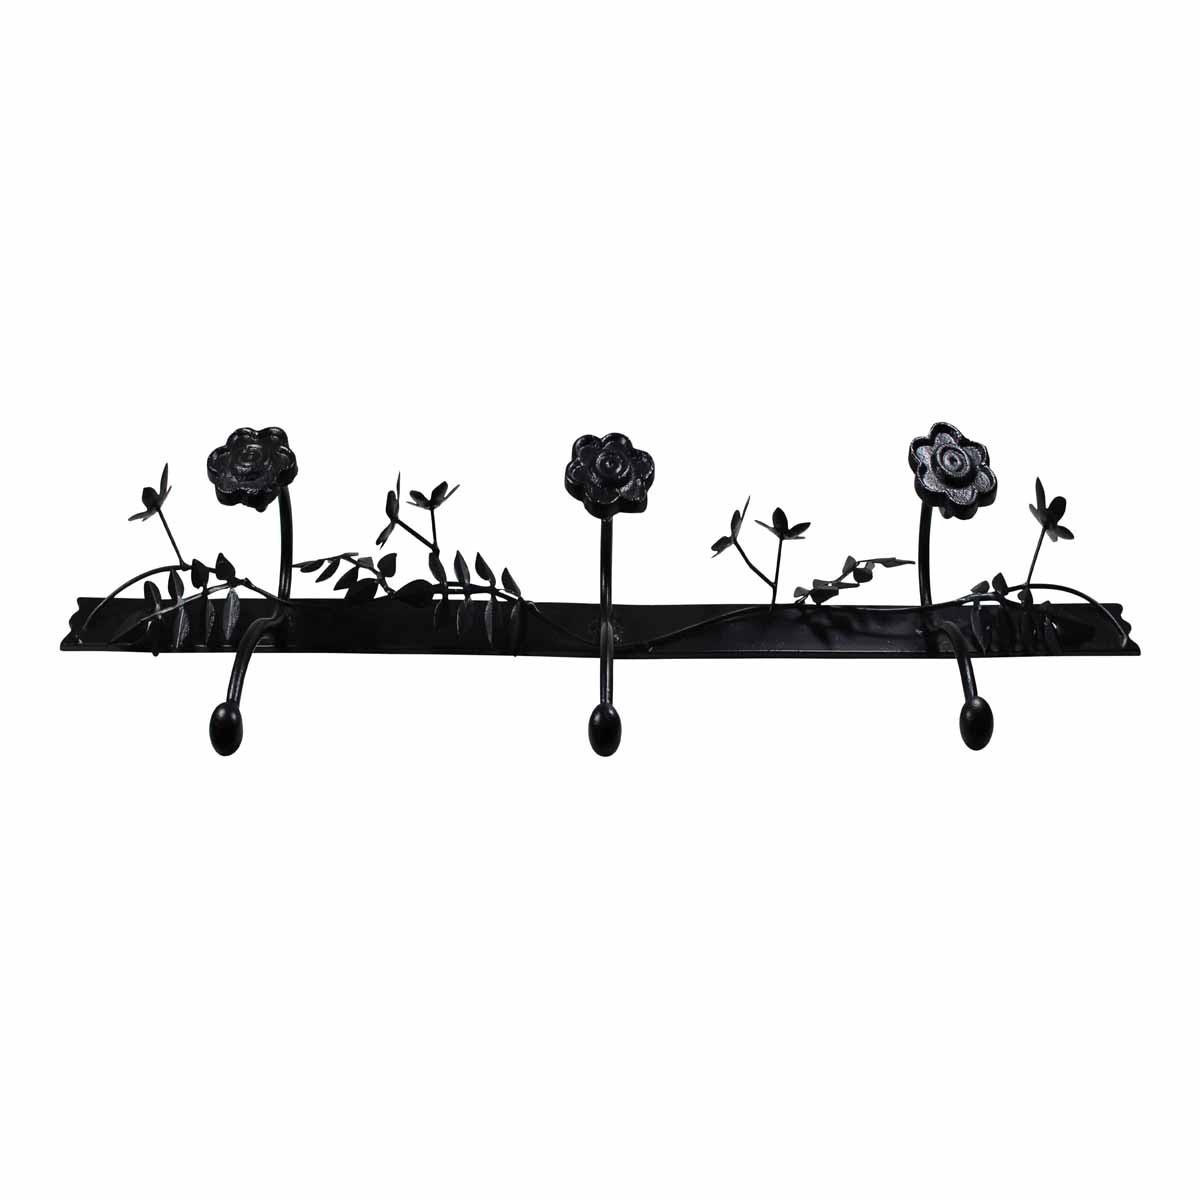 Decorative Triple Hook Black Rose Wrought Iron Hooks Decorative Hook Coat Hook